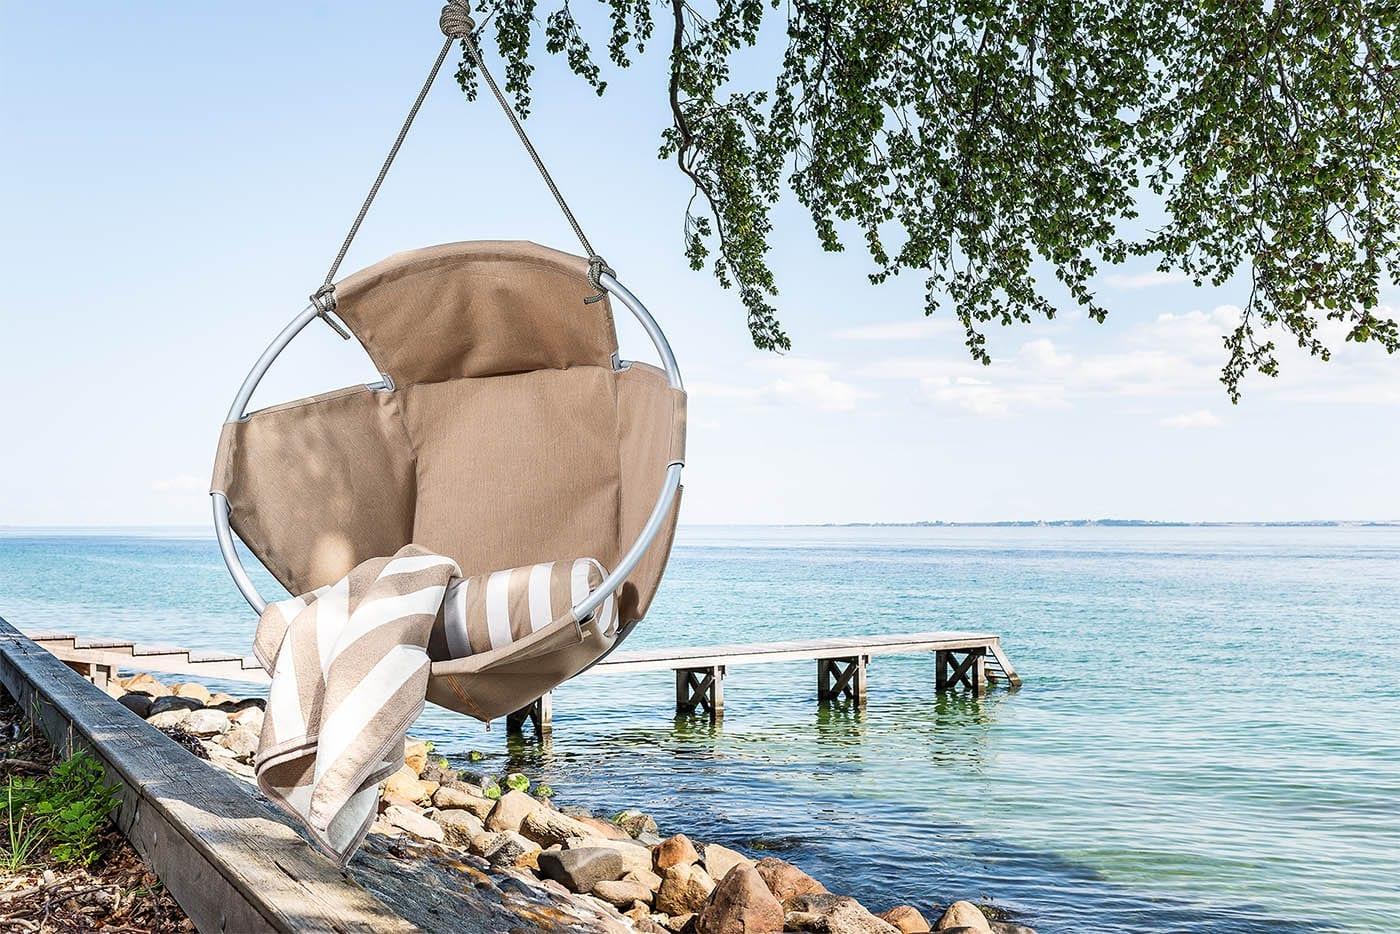 Cocoon-hang-chair-taupe-henger-i-et-tre-ved-vakkert-hav Hagemøbler og utemøbler - Fine design